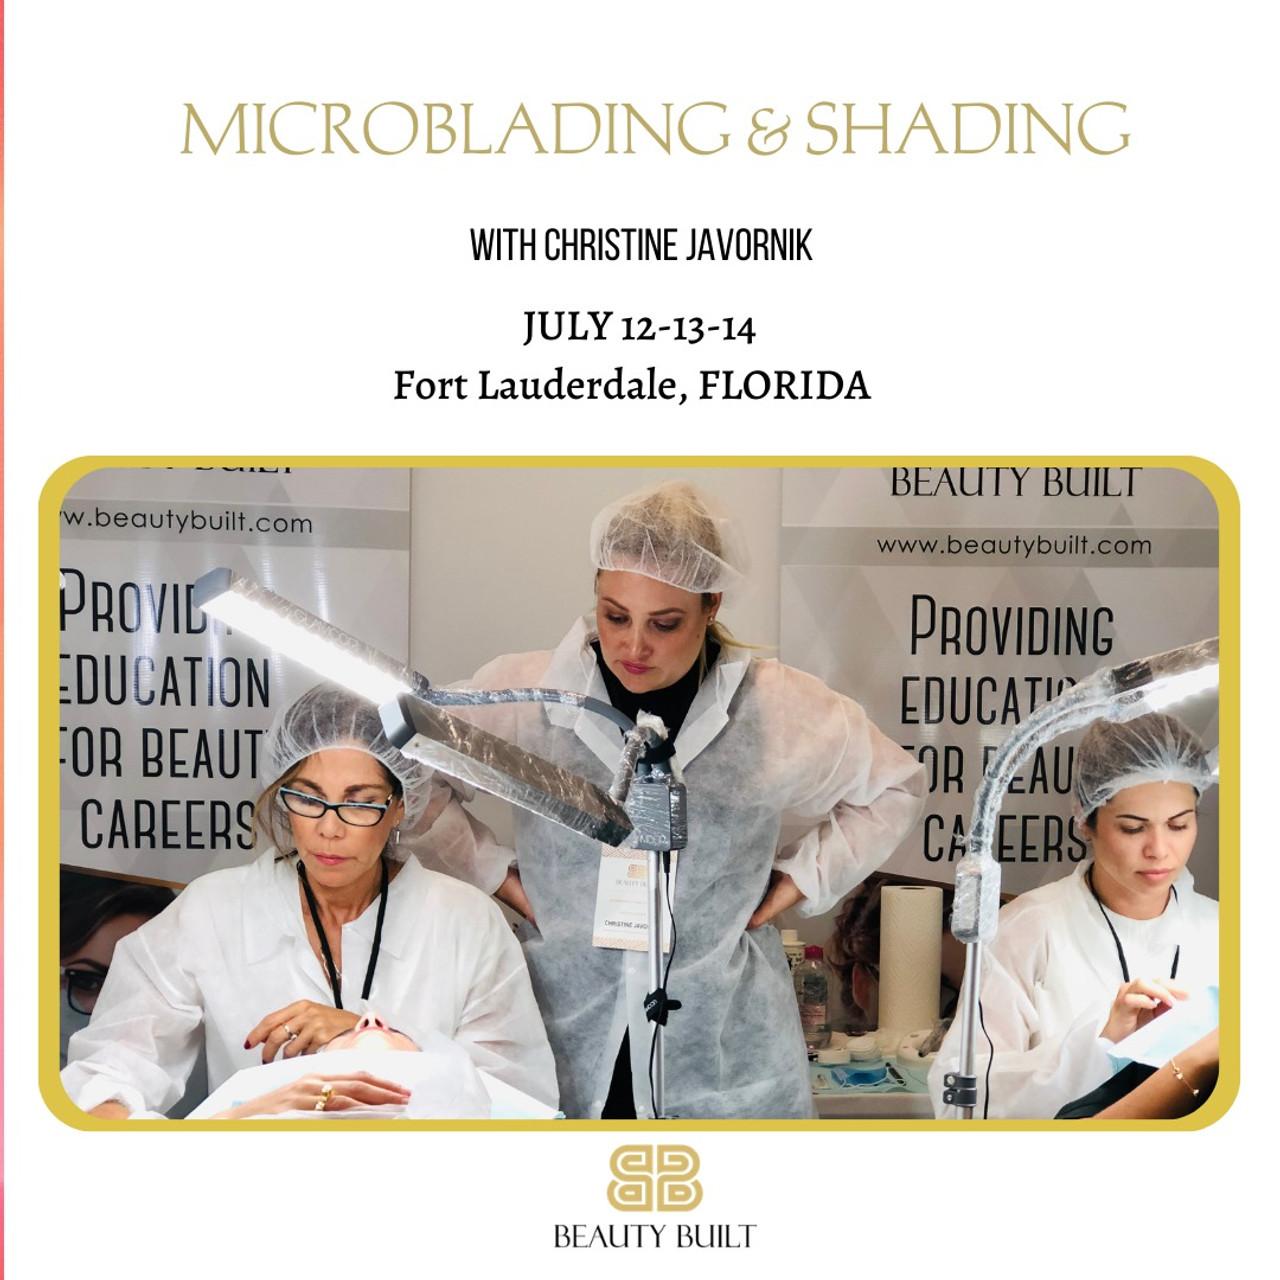 Microblading & Shading - July 12-13-14, 2021 with Christine Javornik